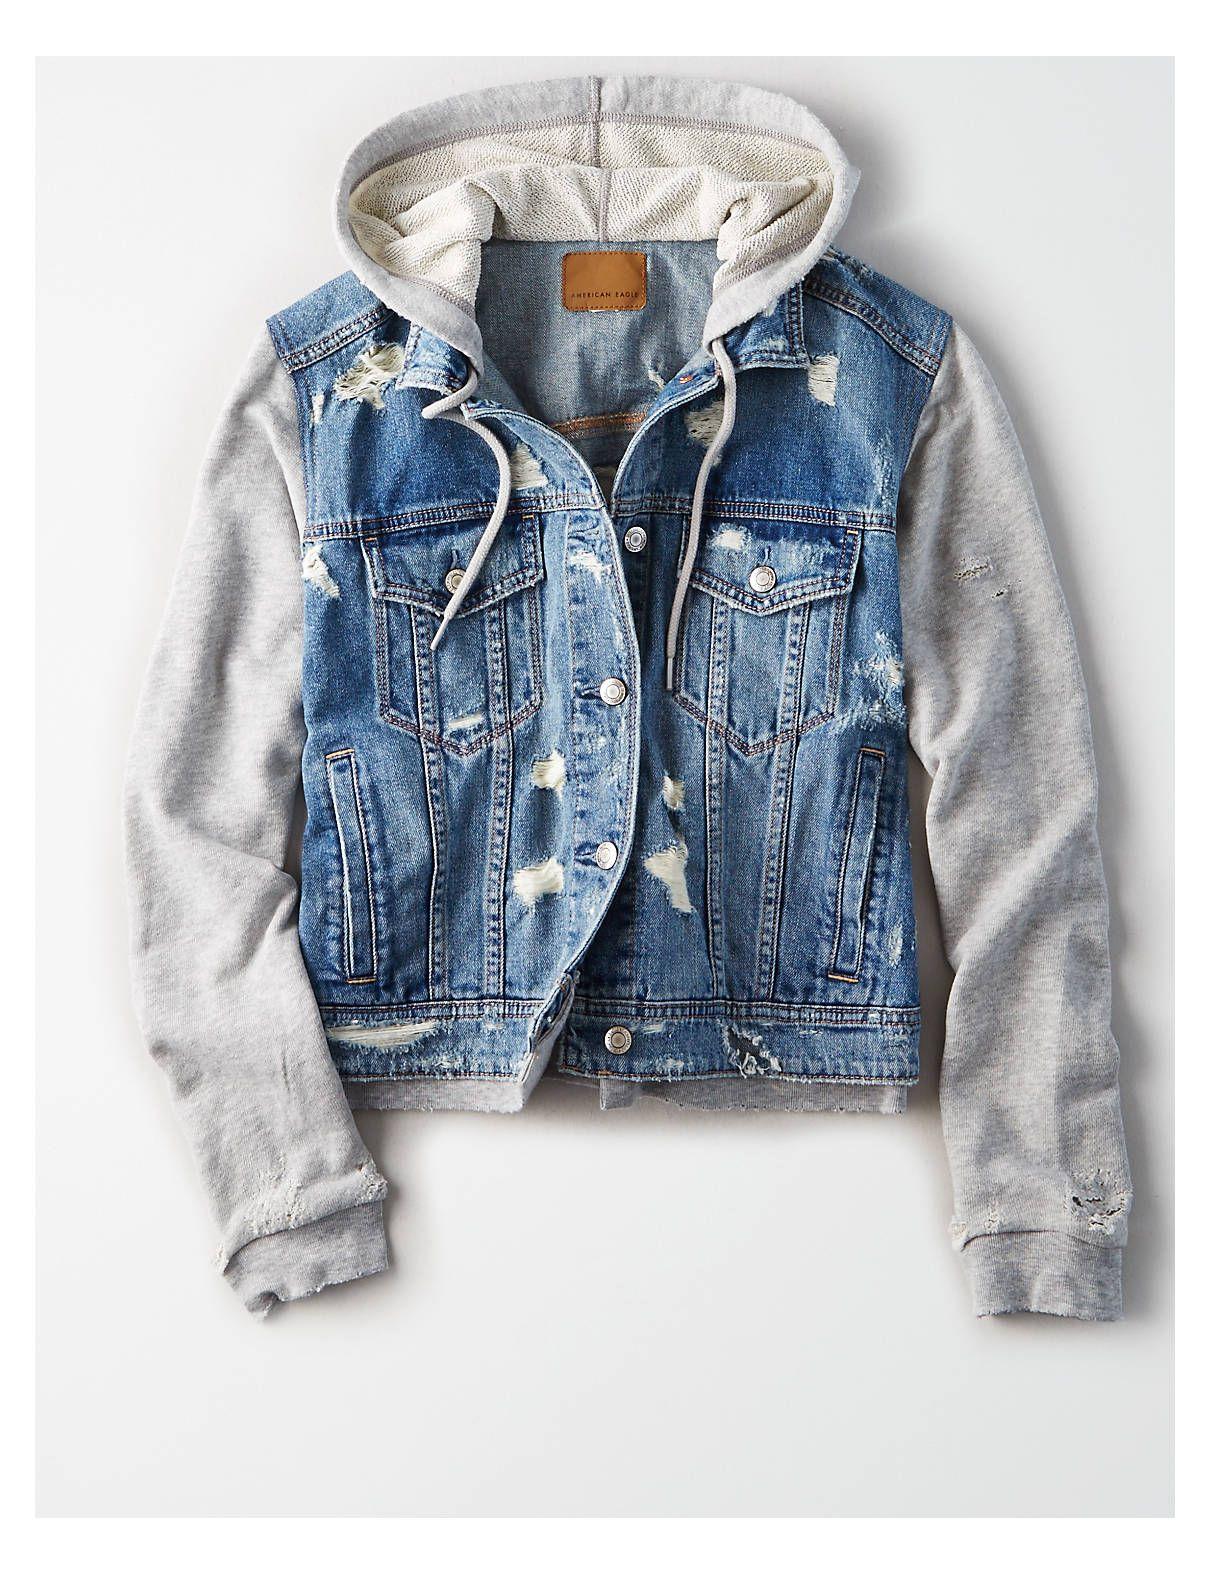 NWT Womens The Limited Dark Wash Blue Denim Jean Jacket Coat Size S Small